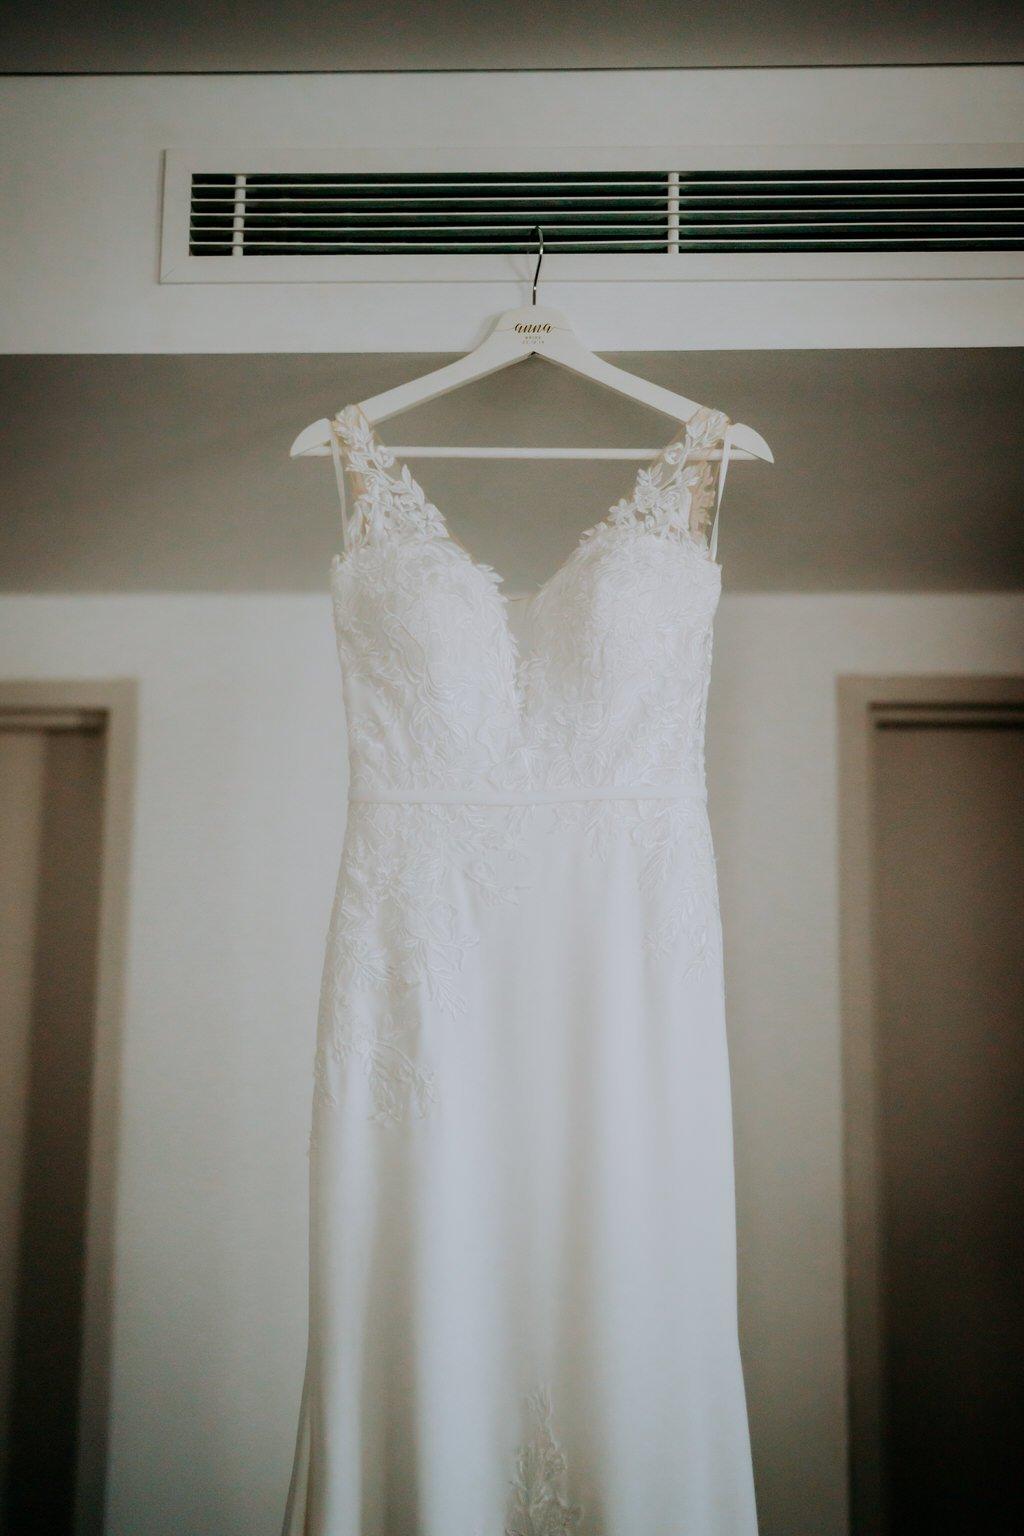 ava-me-photography-anna-sol-centennial-homestead-park-wedding-15